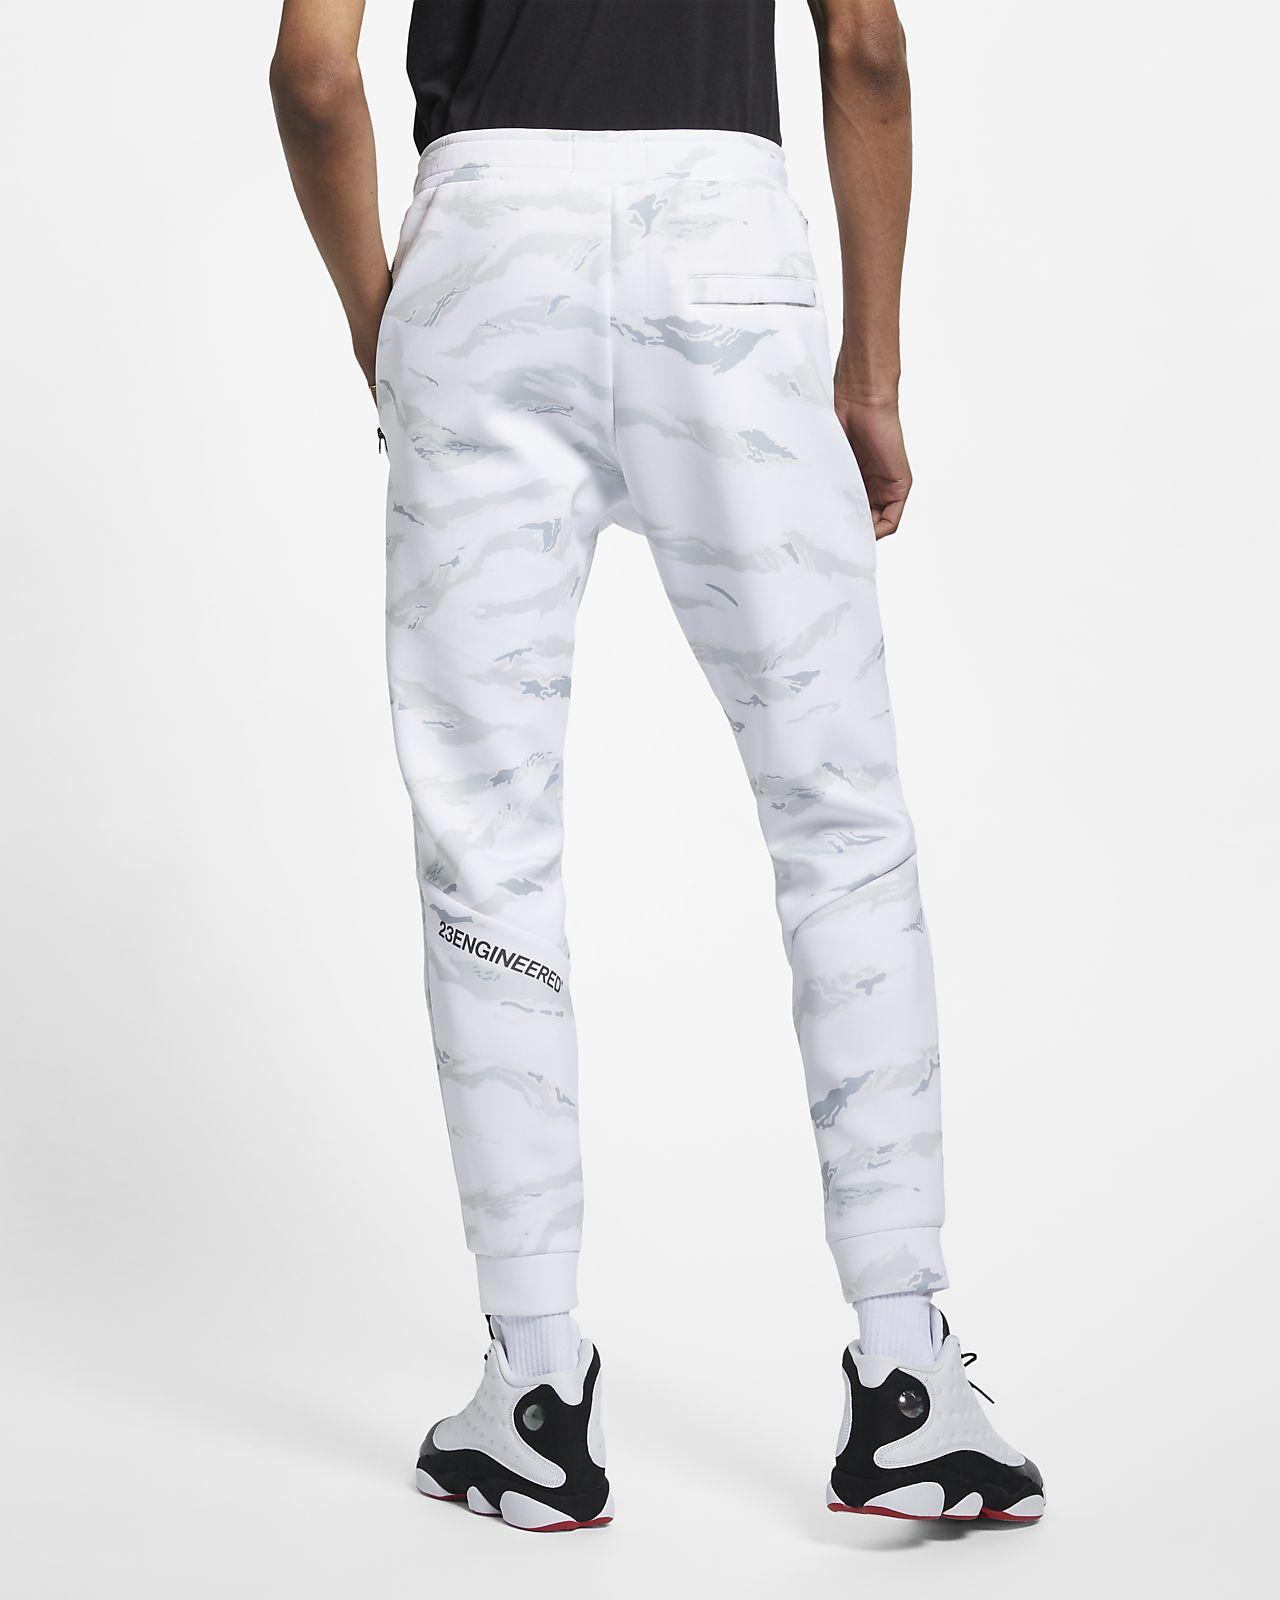 c188745cf7438f Jordan Sportswear Flight Tech Men s Camo Trousers. Nike.com AU